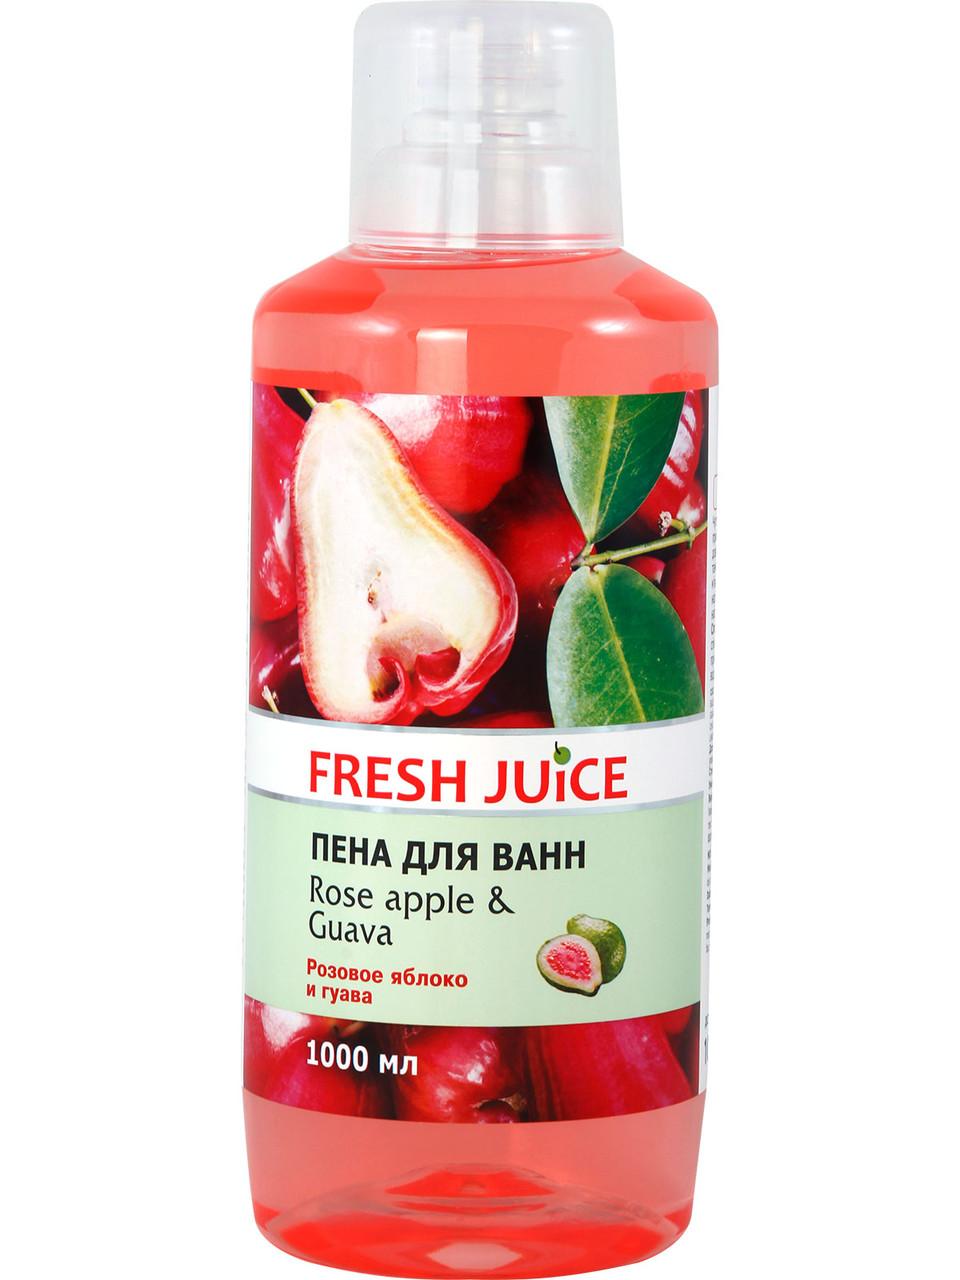 "Пена для ванн Розовое яблоко и гуава ТМ "" Fresh Juice"", 1000 мл."